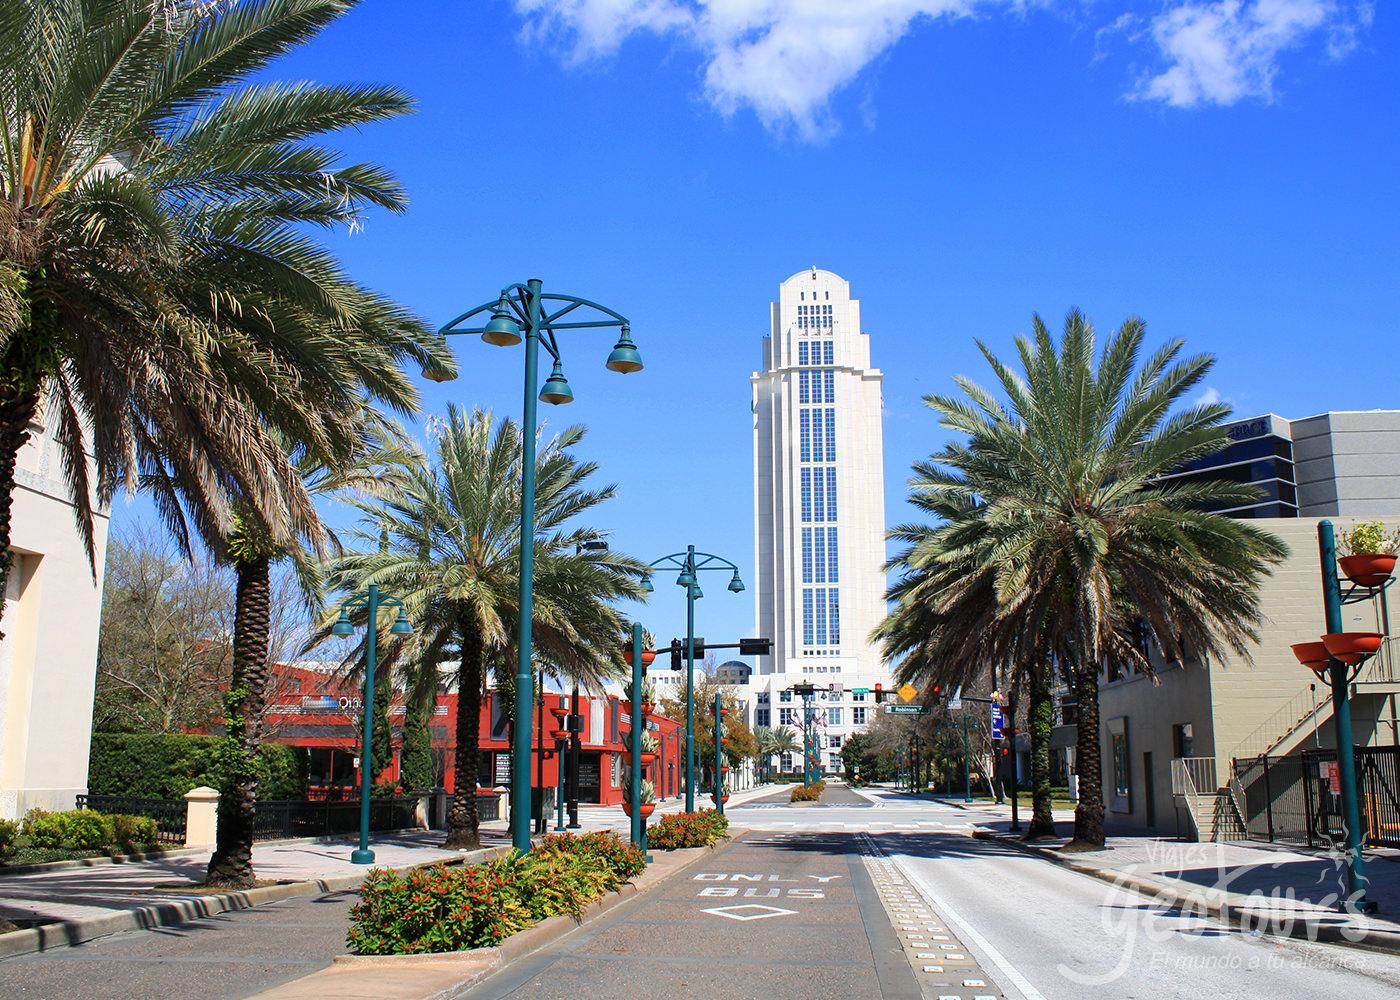 Viajes a lo Mejor de Florida 8 dias